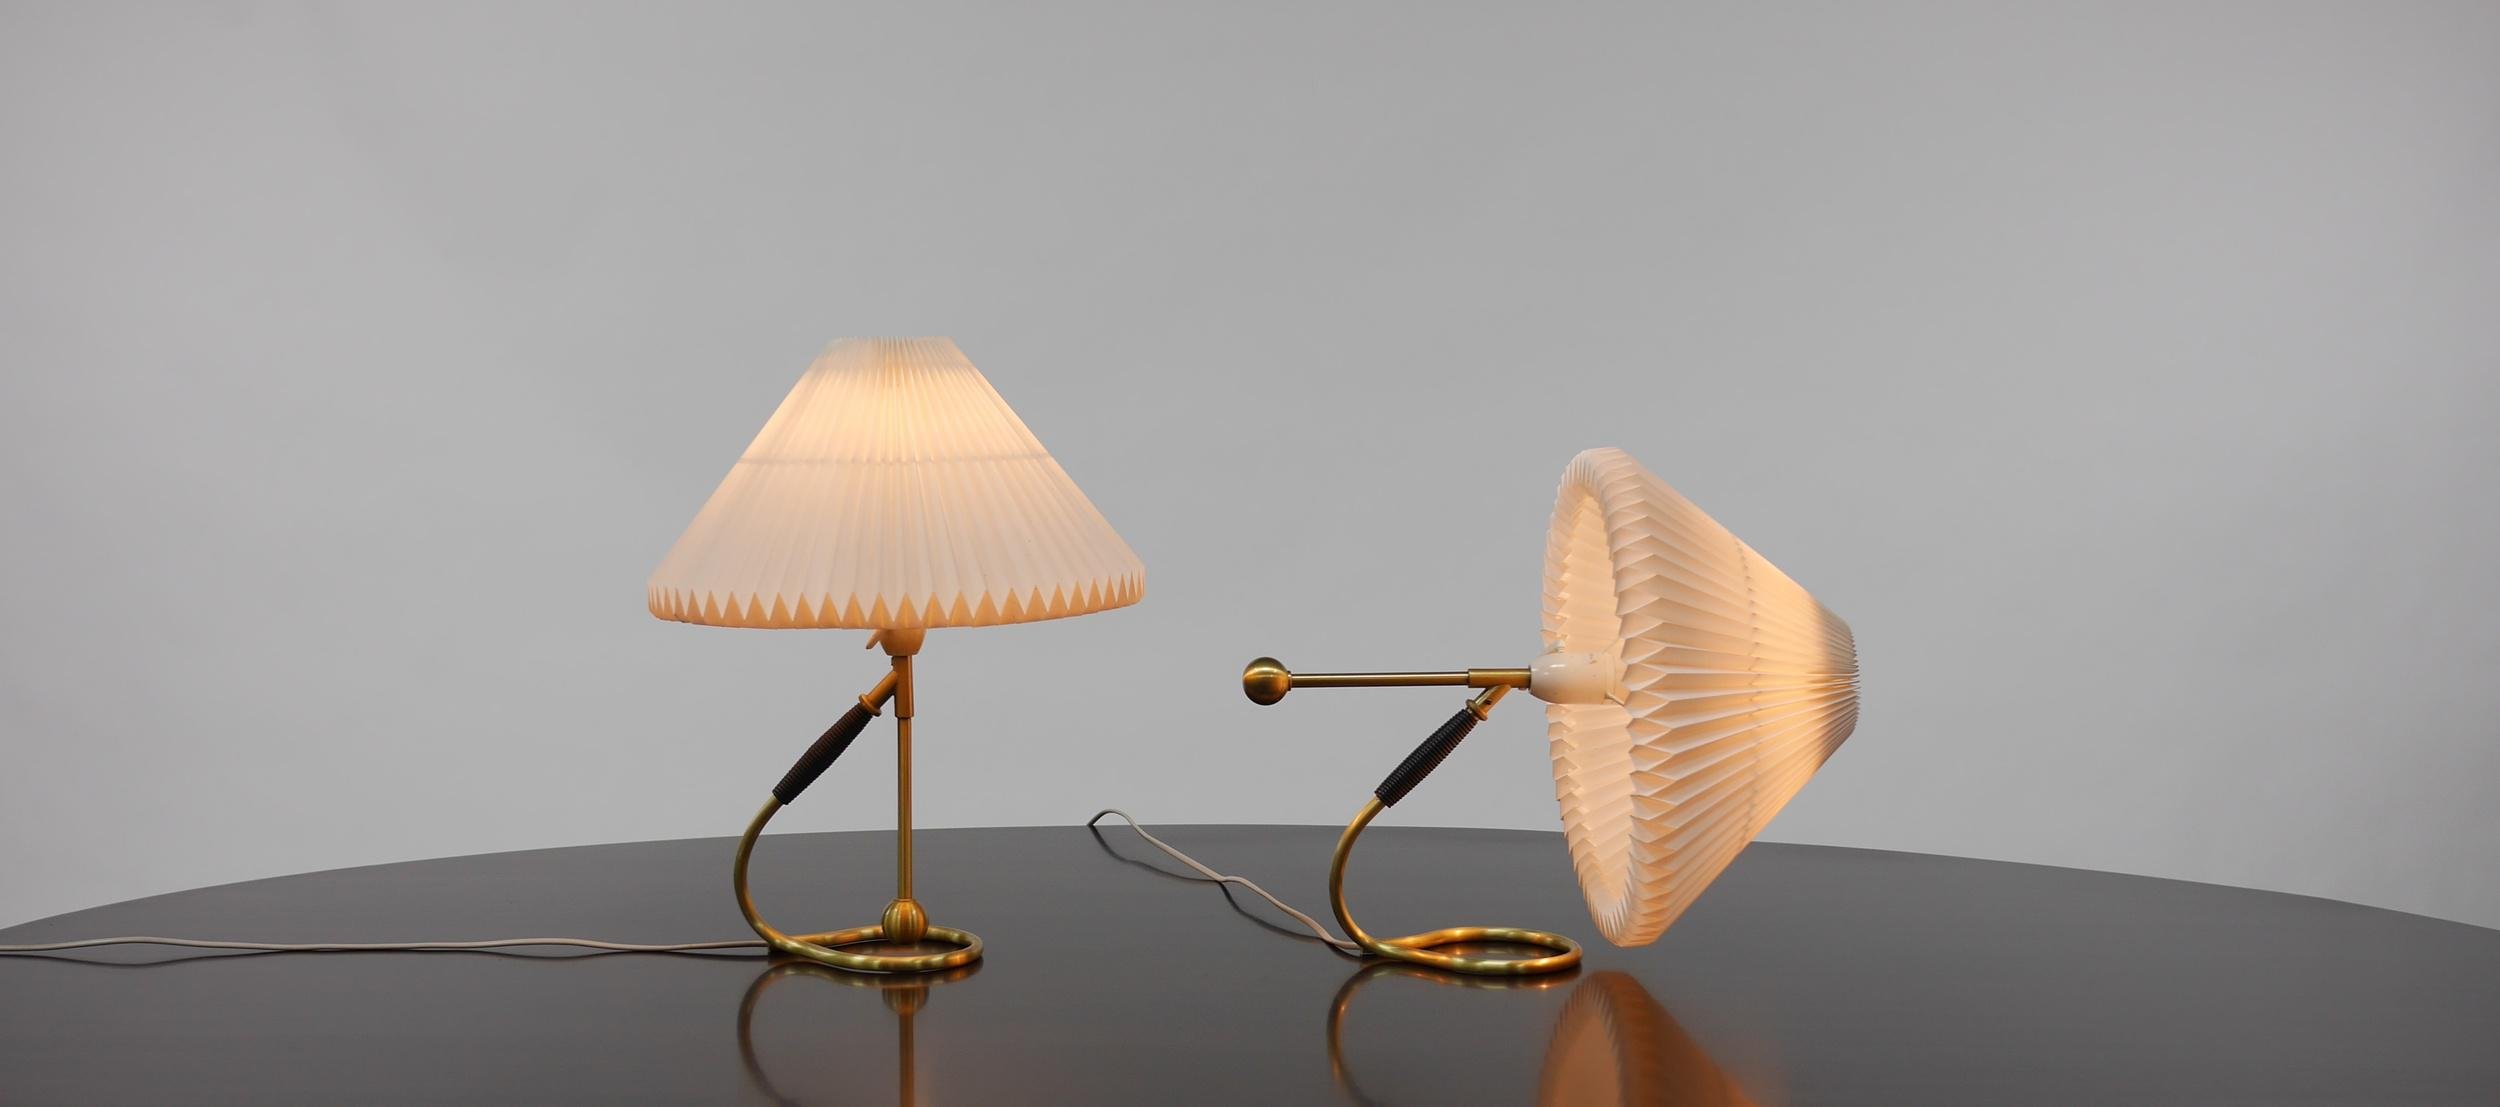 klint lighting. Gold Pair Of Le Klint 306 Lamps By Kaare For Sale - Image 8 Klint Lighting